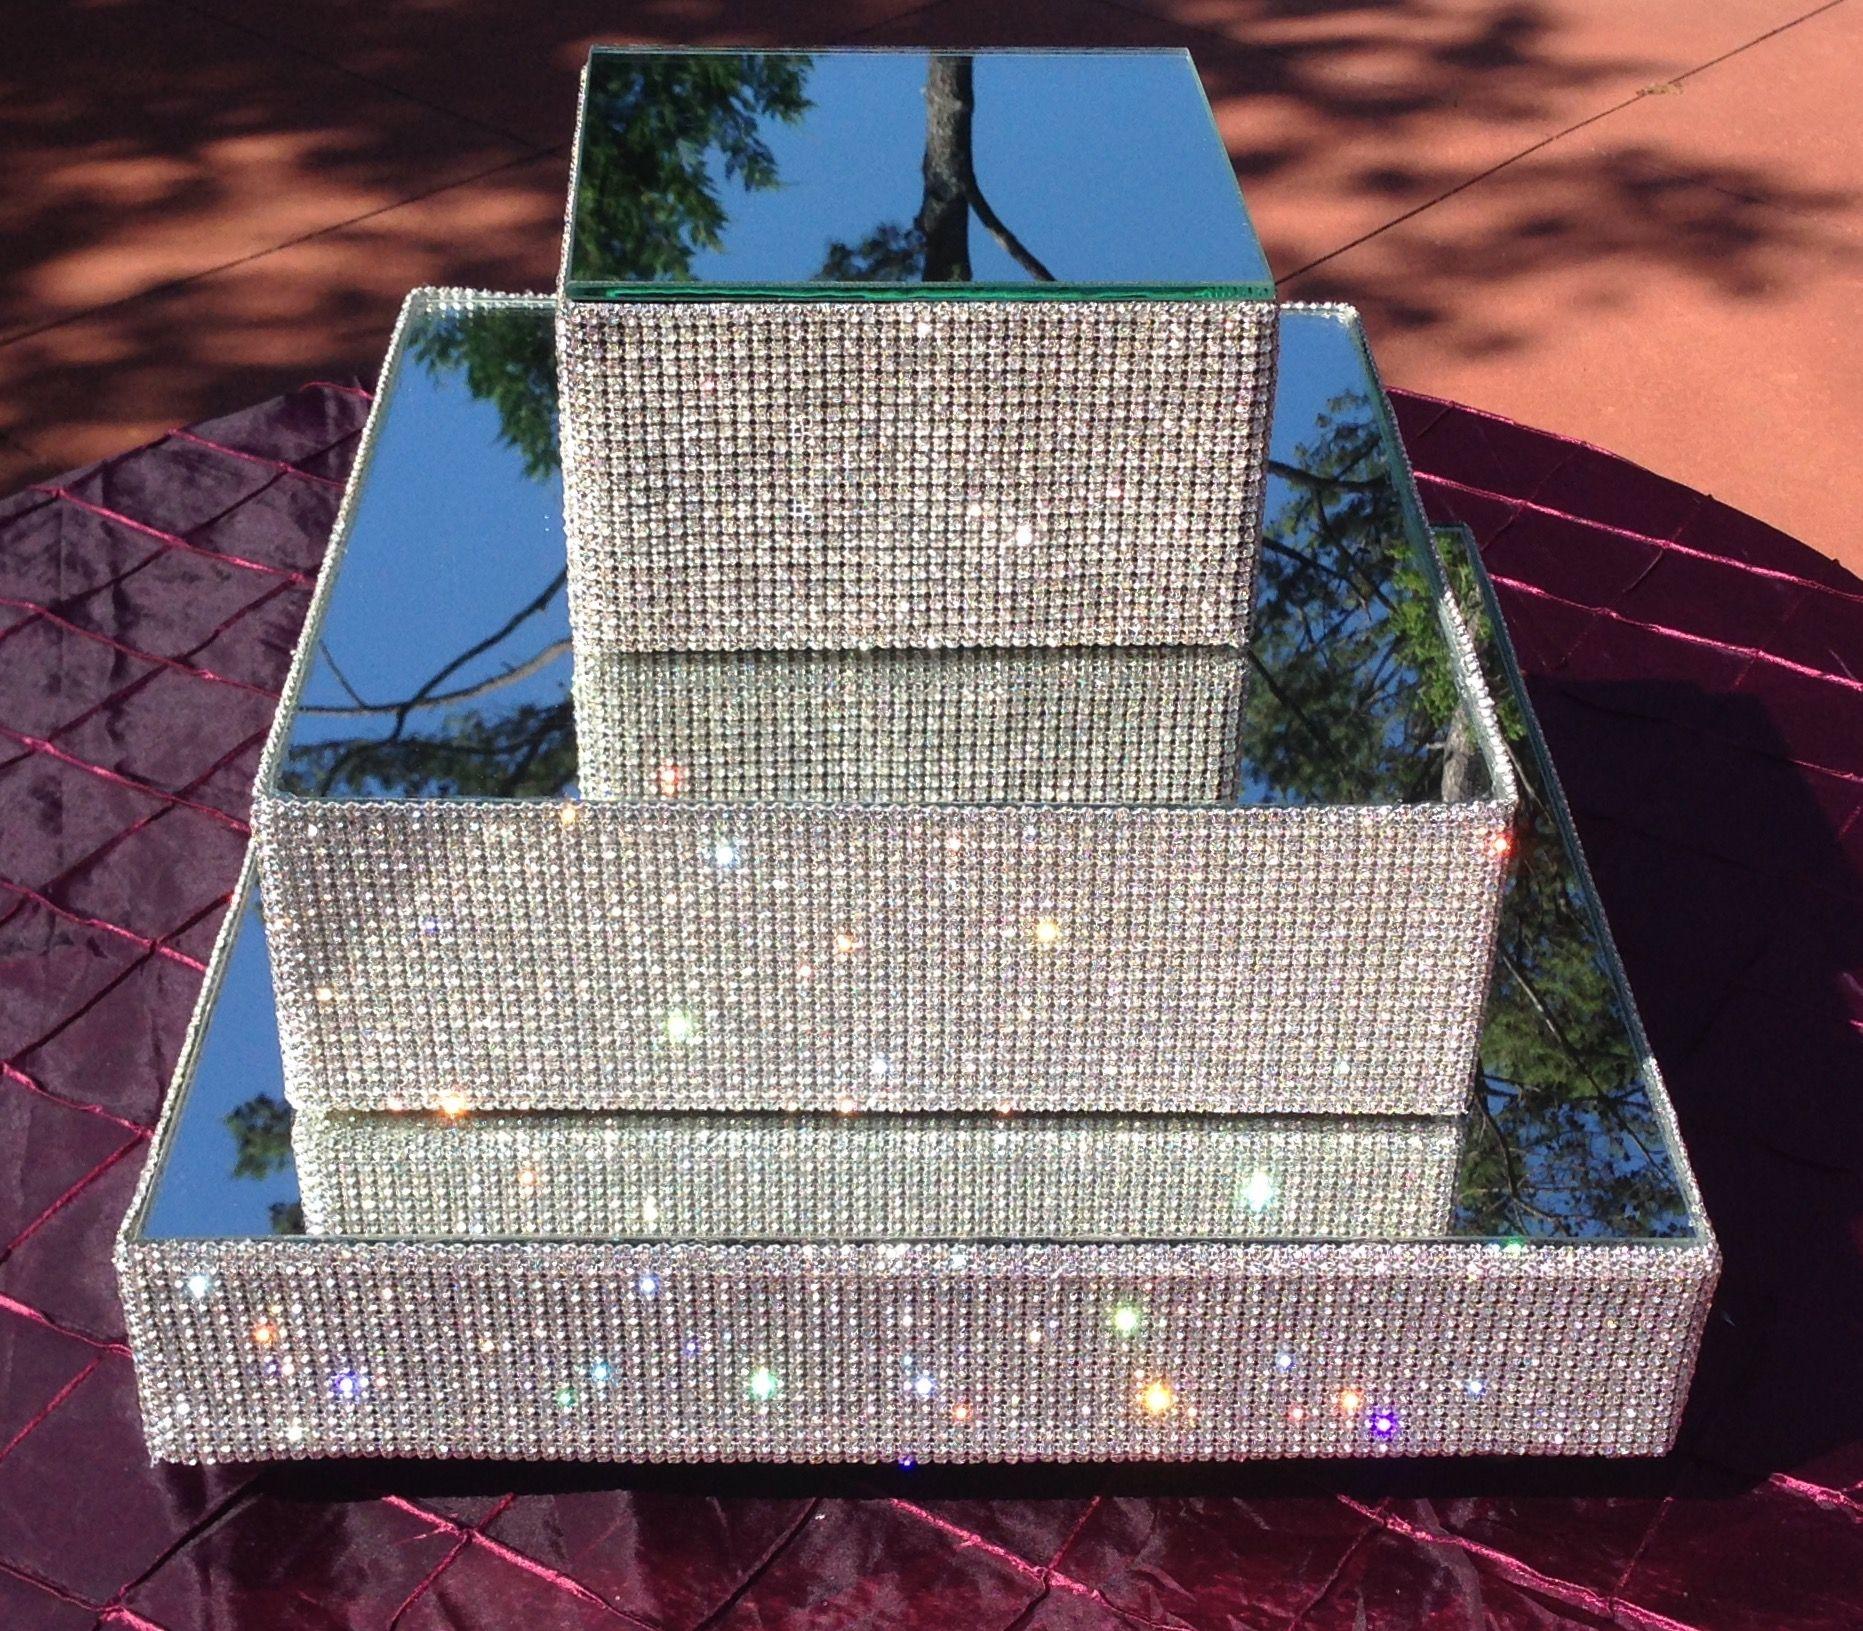 Genuine Crystal Glass Rhinestone Cake Stands By Elevate The Cake